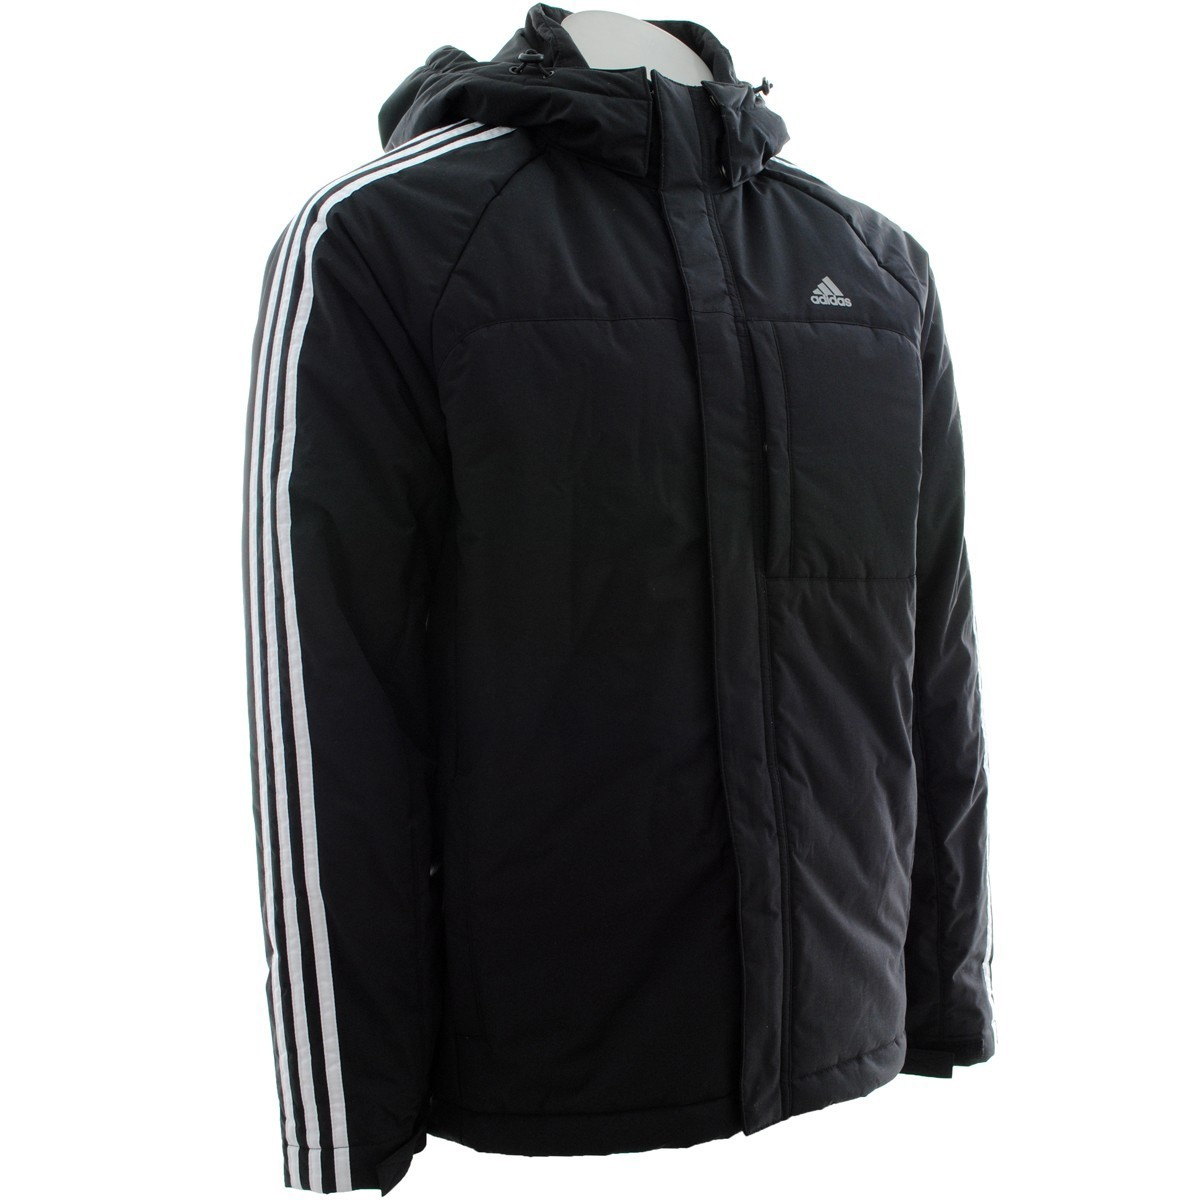 0e75745969 ... 888a99b0ae1 Bizz Store - Jaqueta Masculina Adidas Hood 3s BTS Preta  X21212 ...